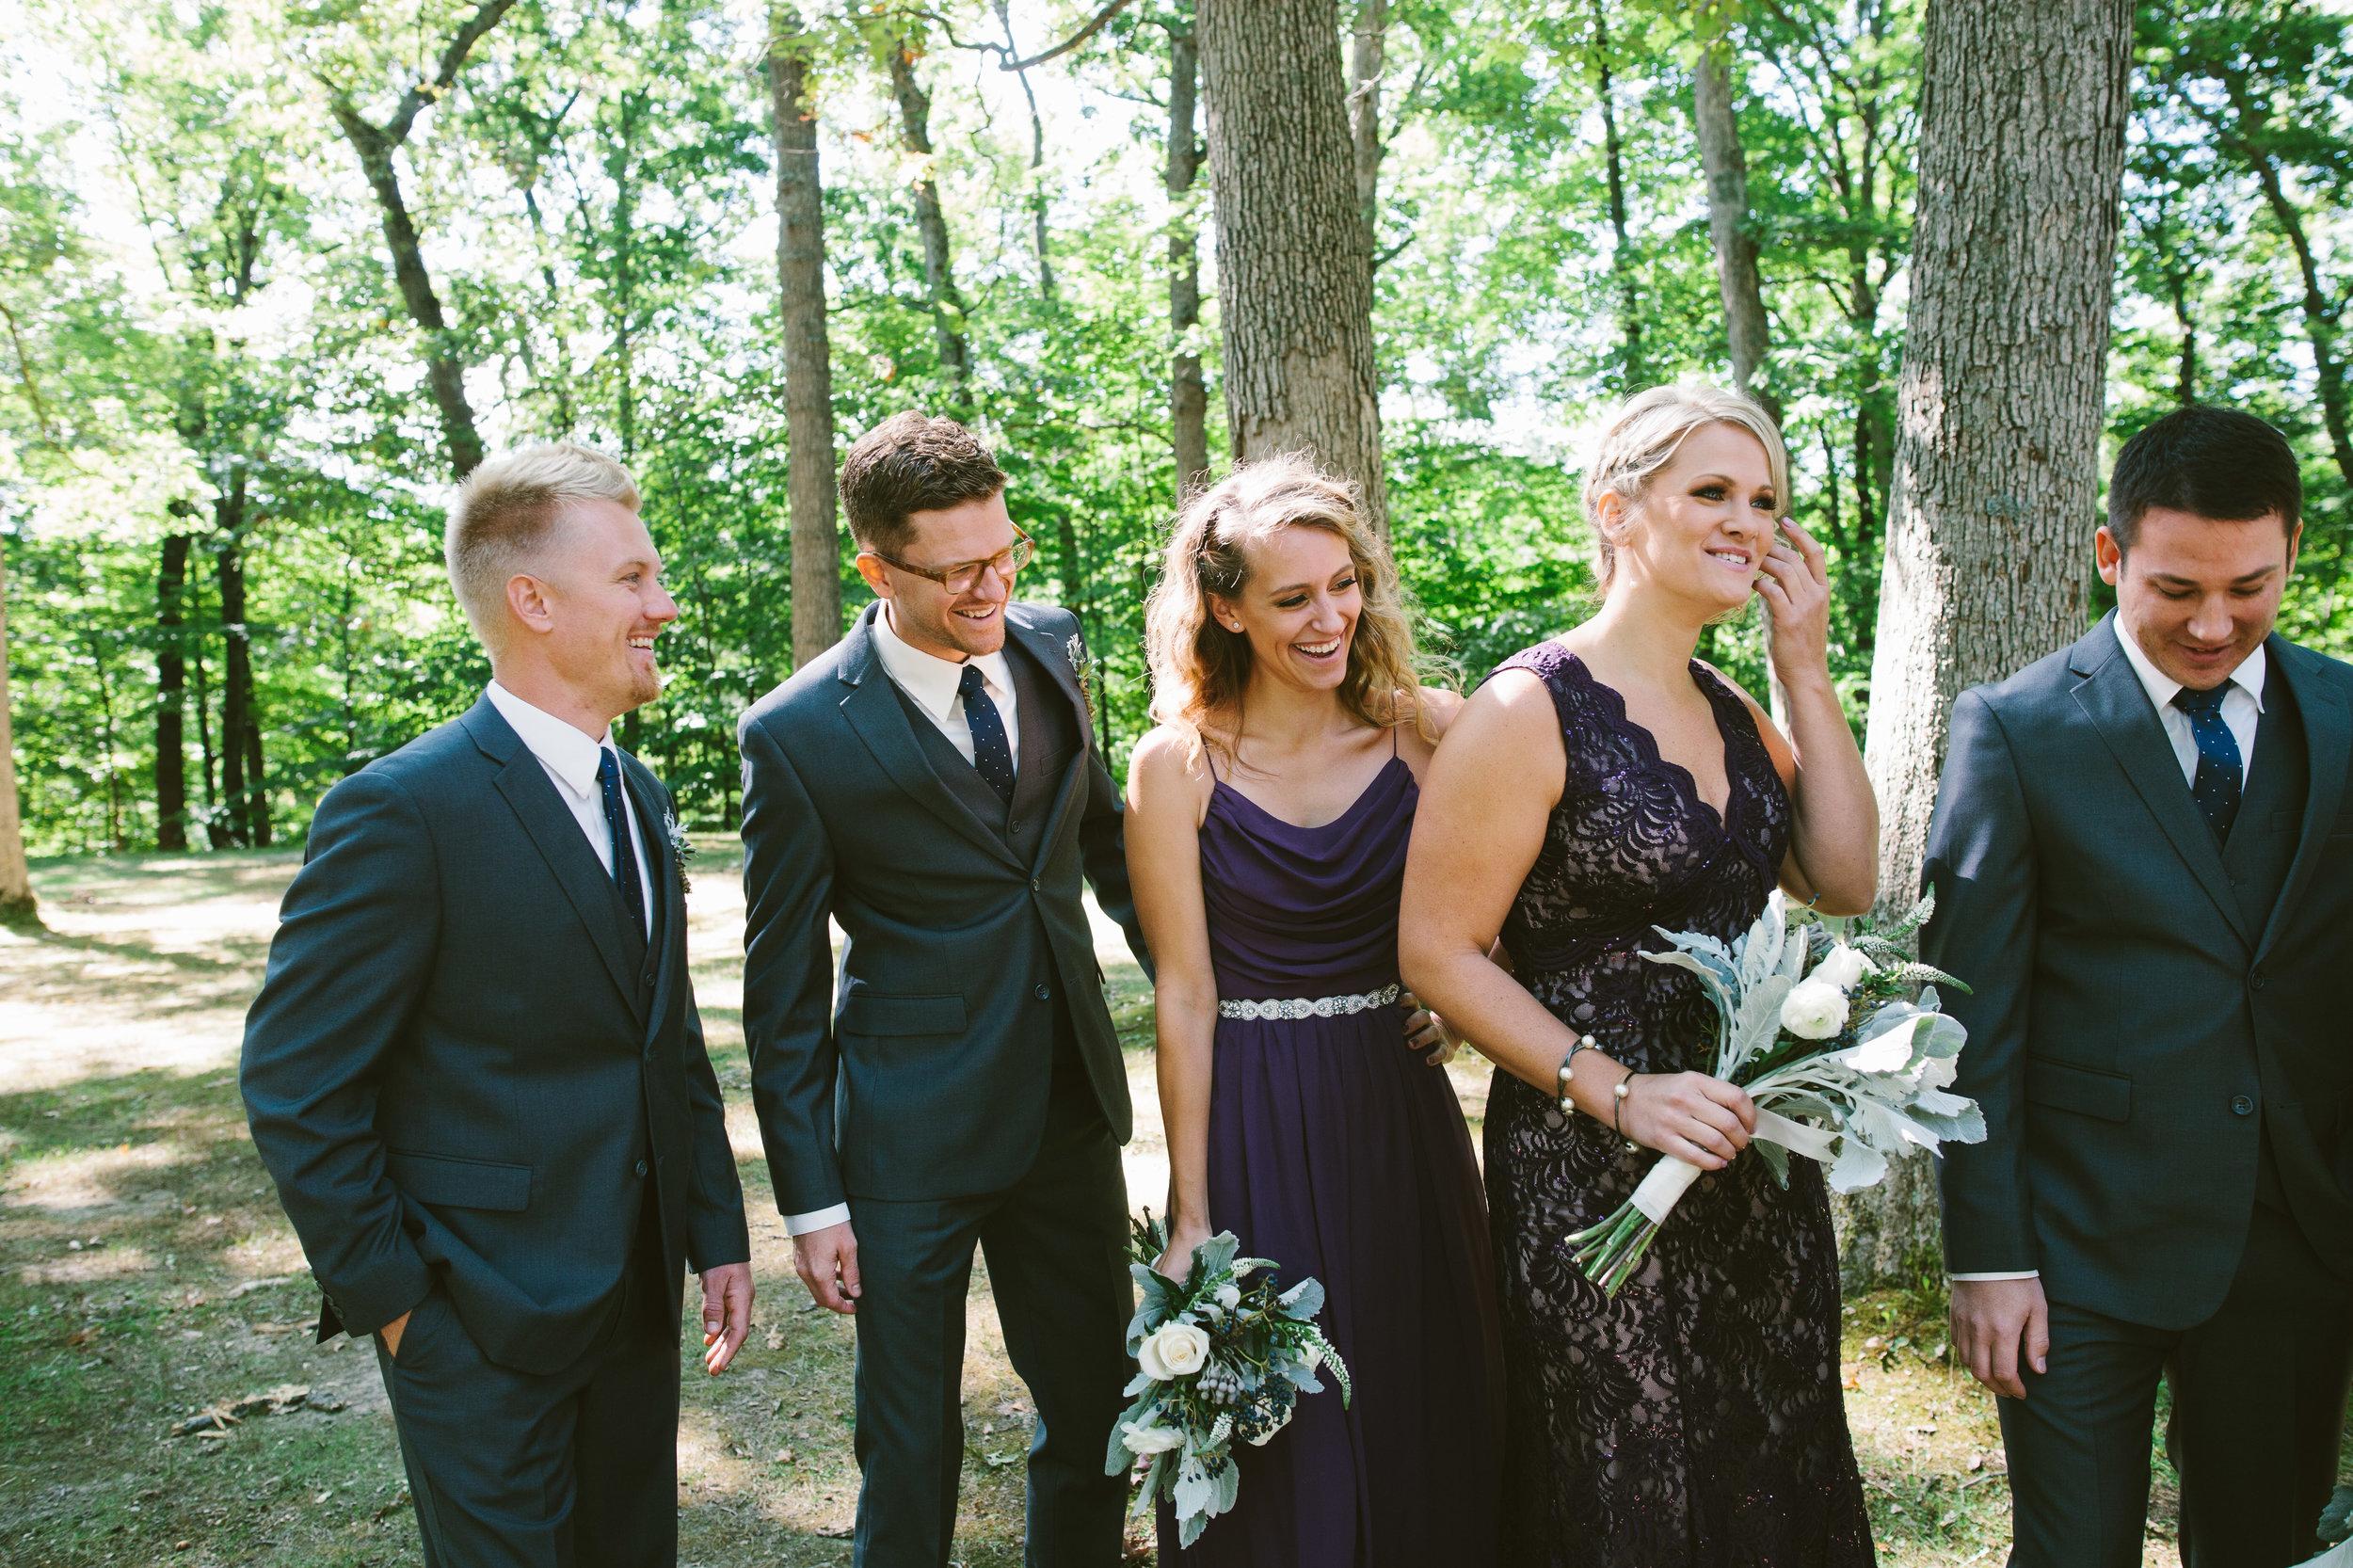 grand_rapids_wedding_rockford_wedding_richard_app_gallery_wedding_grand_rapids_wedding_photographer_summer_wedding_wabasis_lake_park_wedding_rustic_wedding-27.jpg